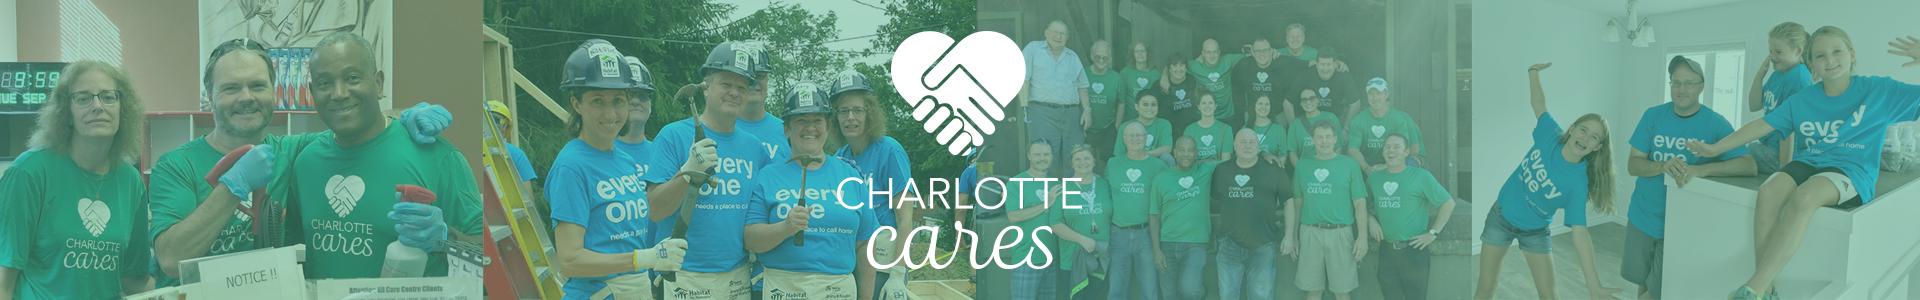 Charlotte Cares